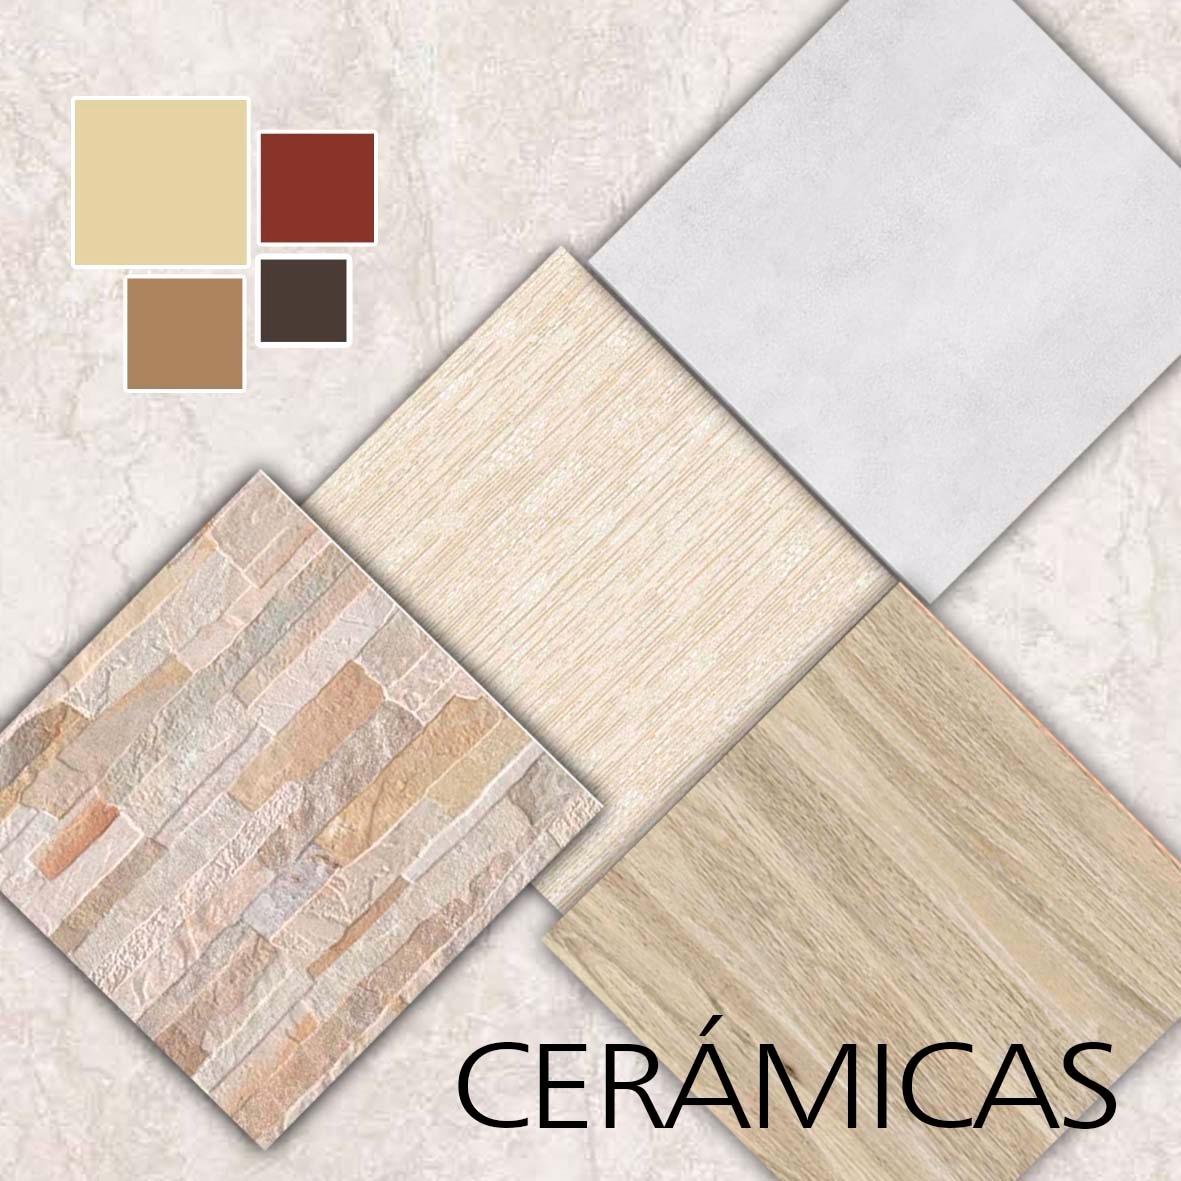 Piso ceramico claro ceramicas cortines adoquinado pisos y for Ceramica para pared